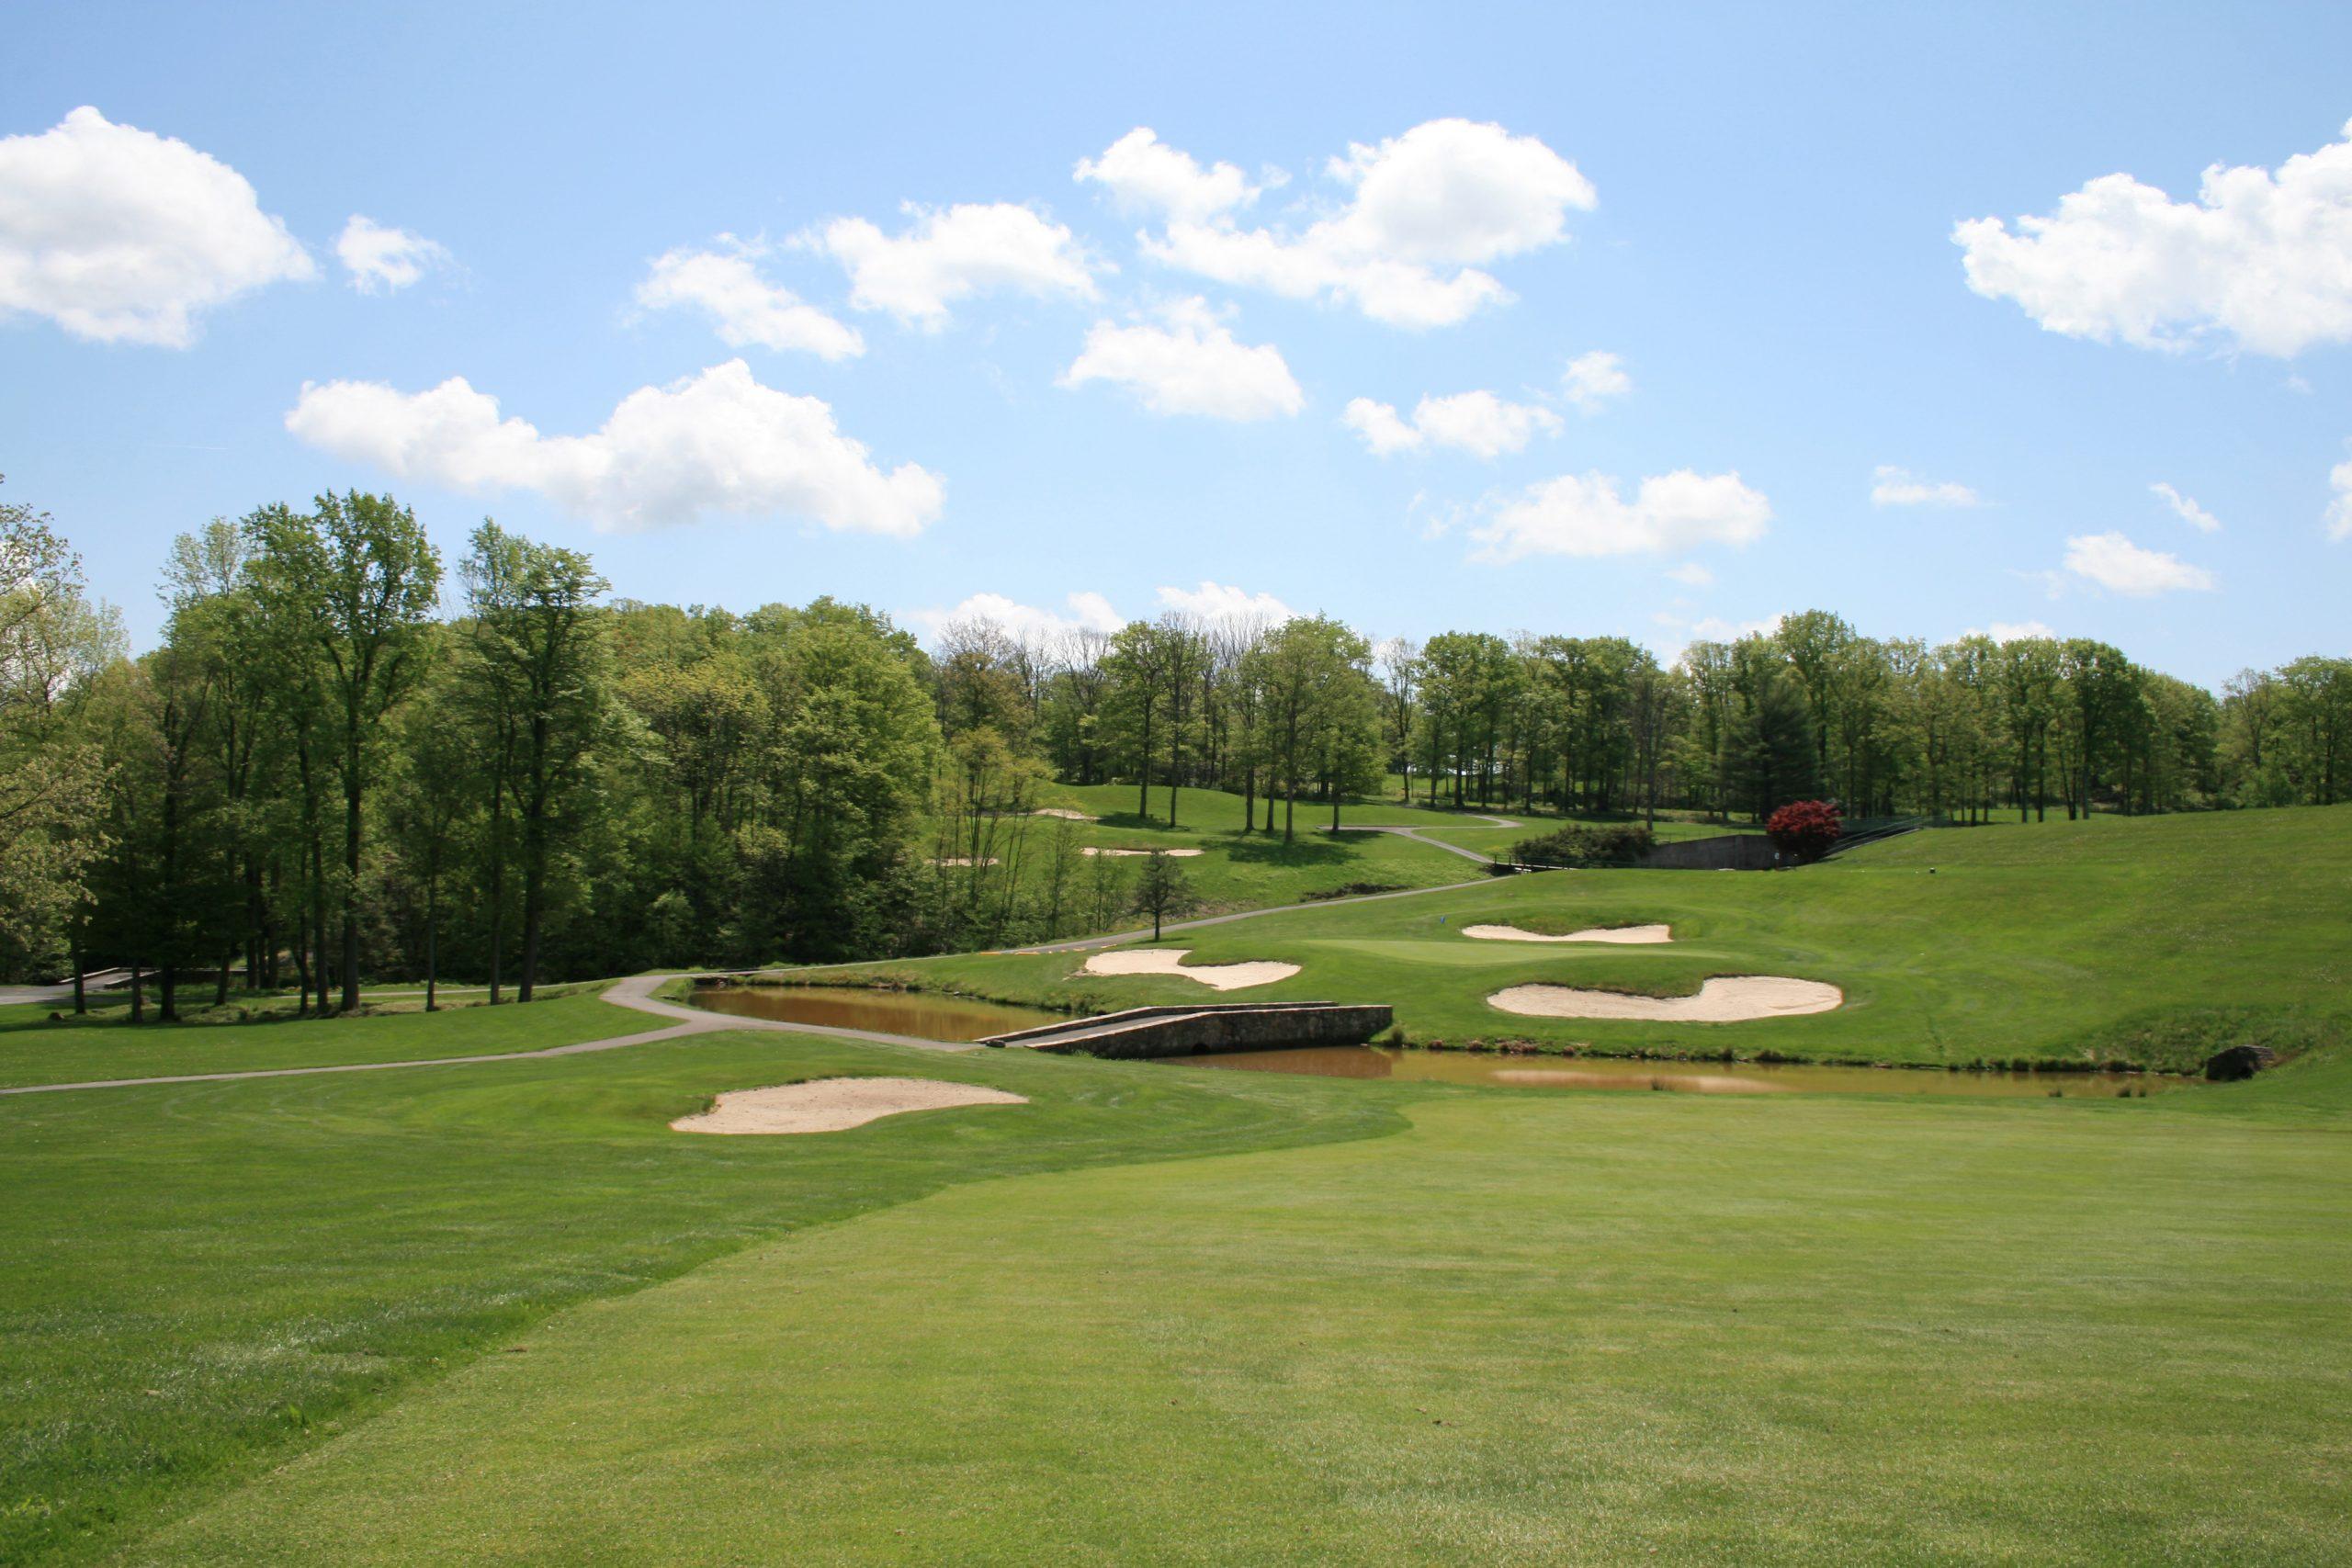 Golf bridge